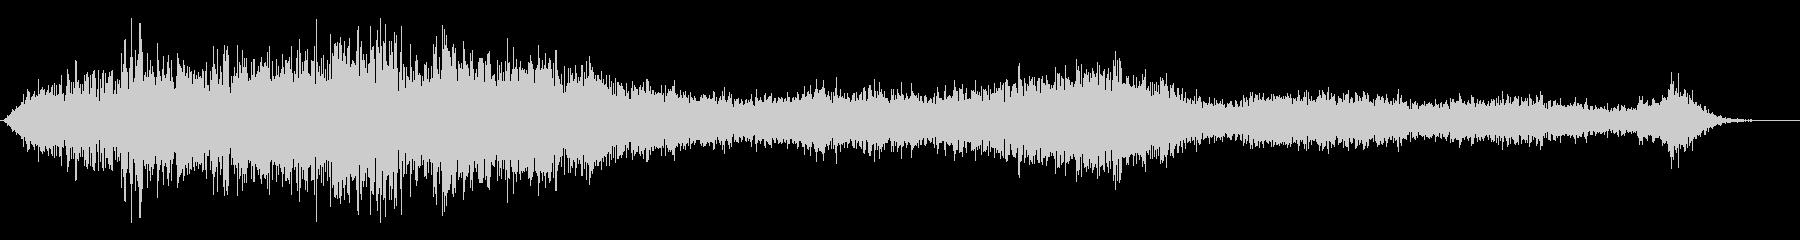 Sonaコレクターポッド:コレクタ...の未再生の波形